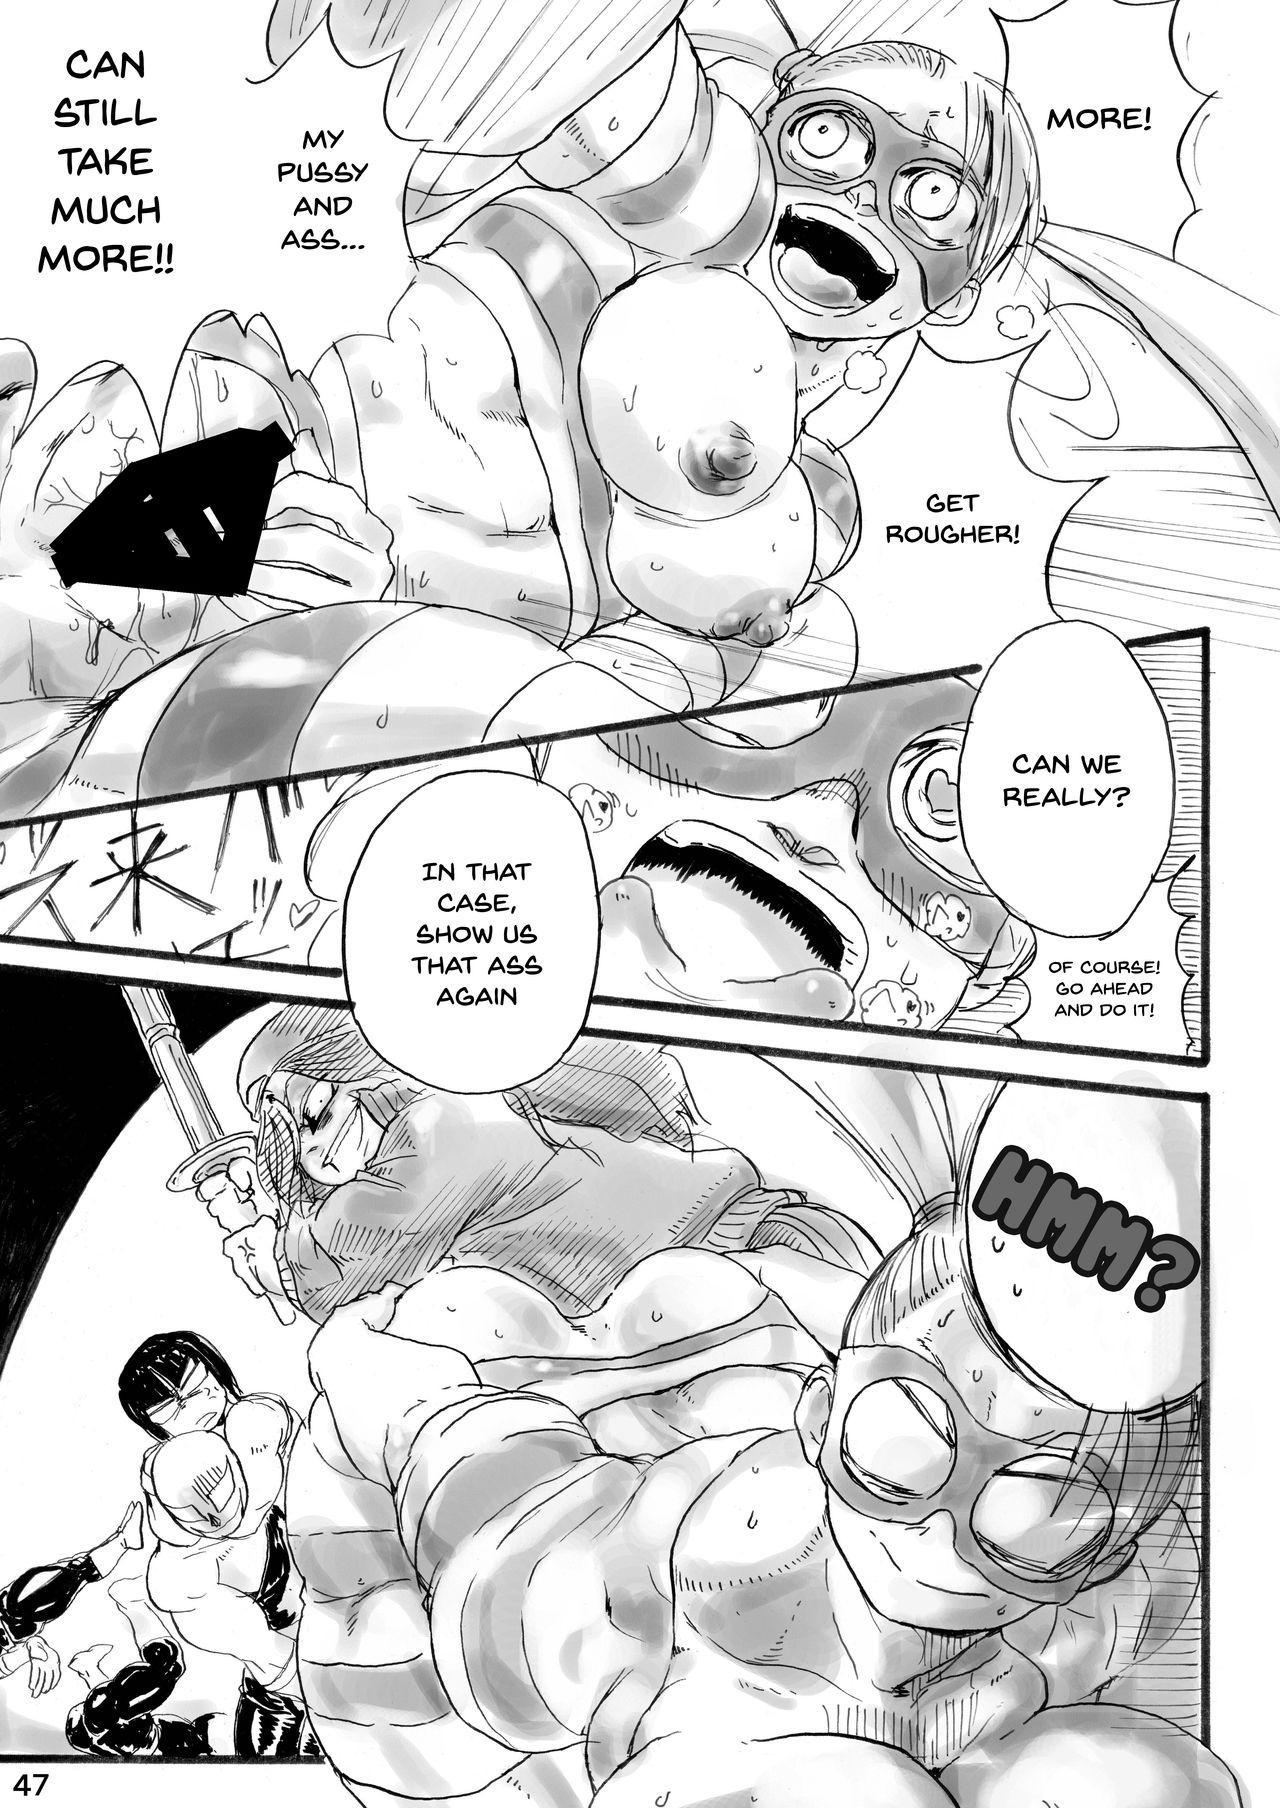 [POWERPLAY (Various)] CAPCOM (& MORE!) VS FIGHTING GIRLS Swimsuit & Gangbang Special (Various) [English] {Doujins.com} [Digital] 43